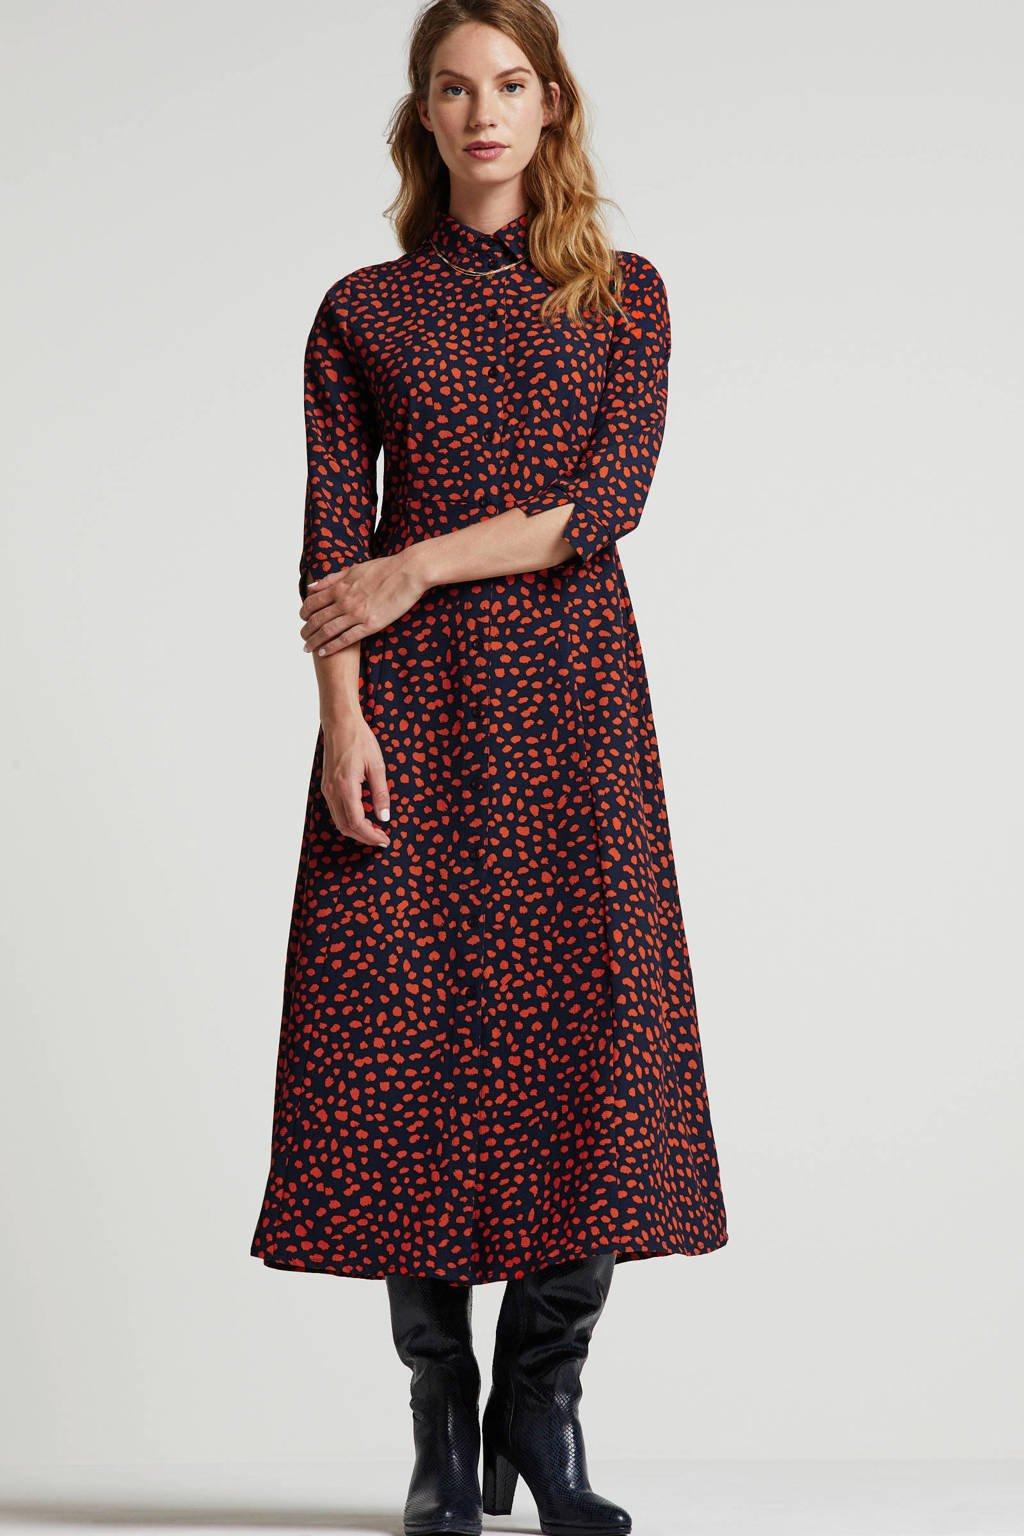 wehkamp maxi jurk met all over print donkerblauw, Brique/ecru/donkerrood